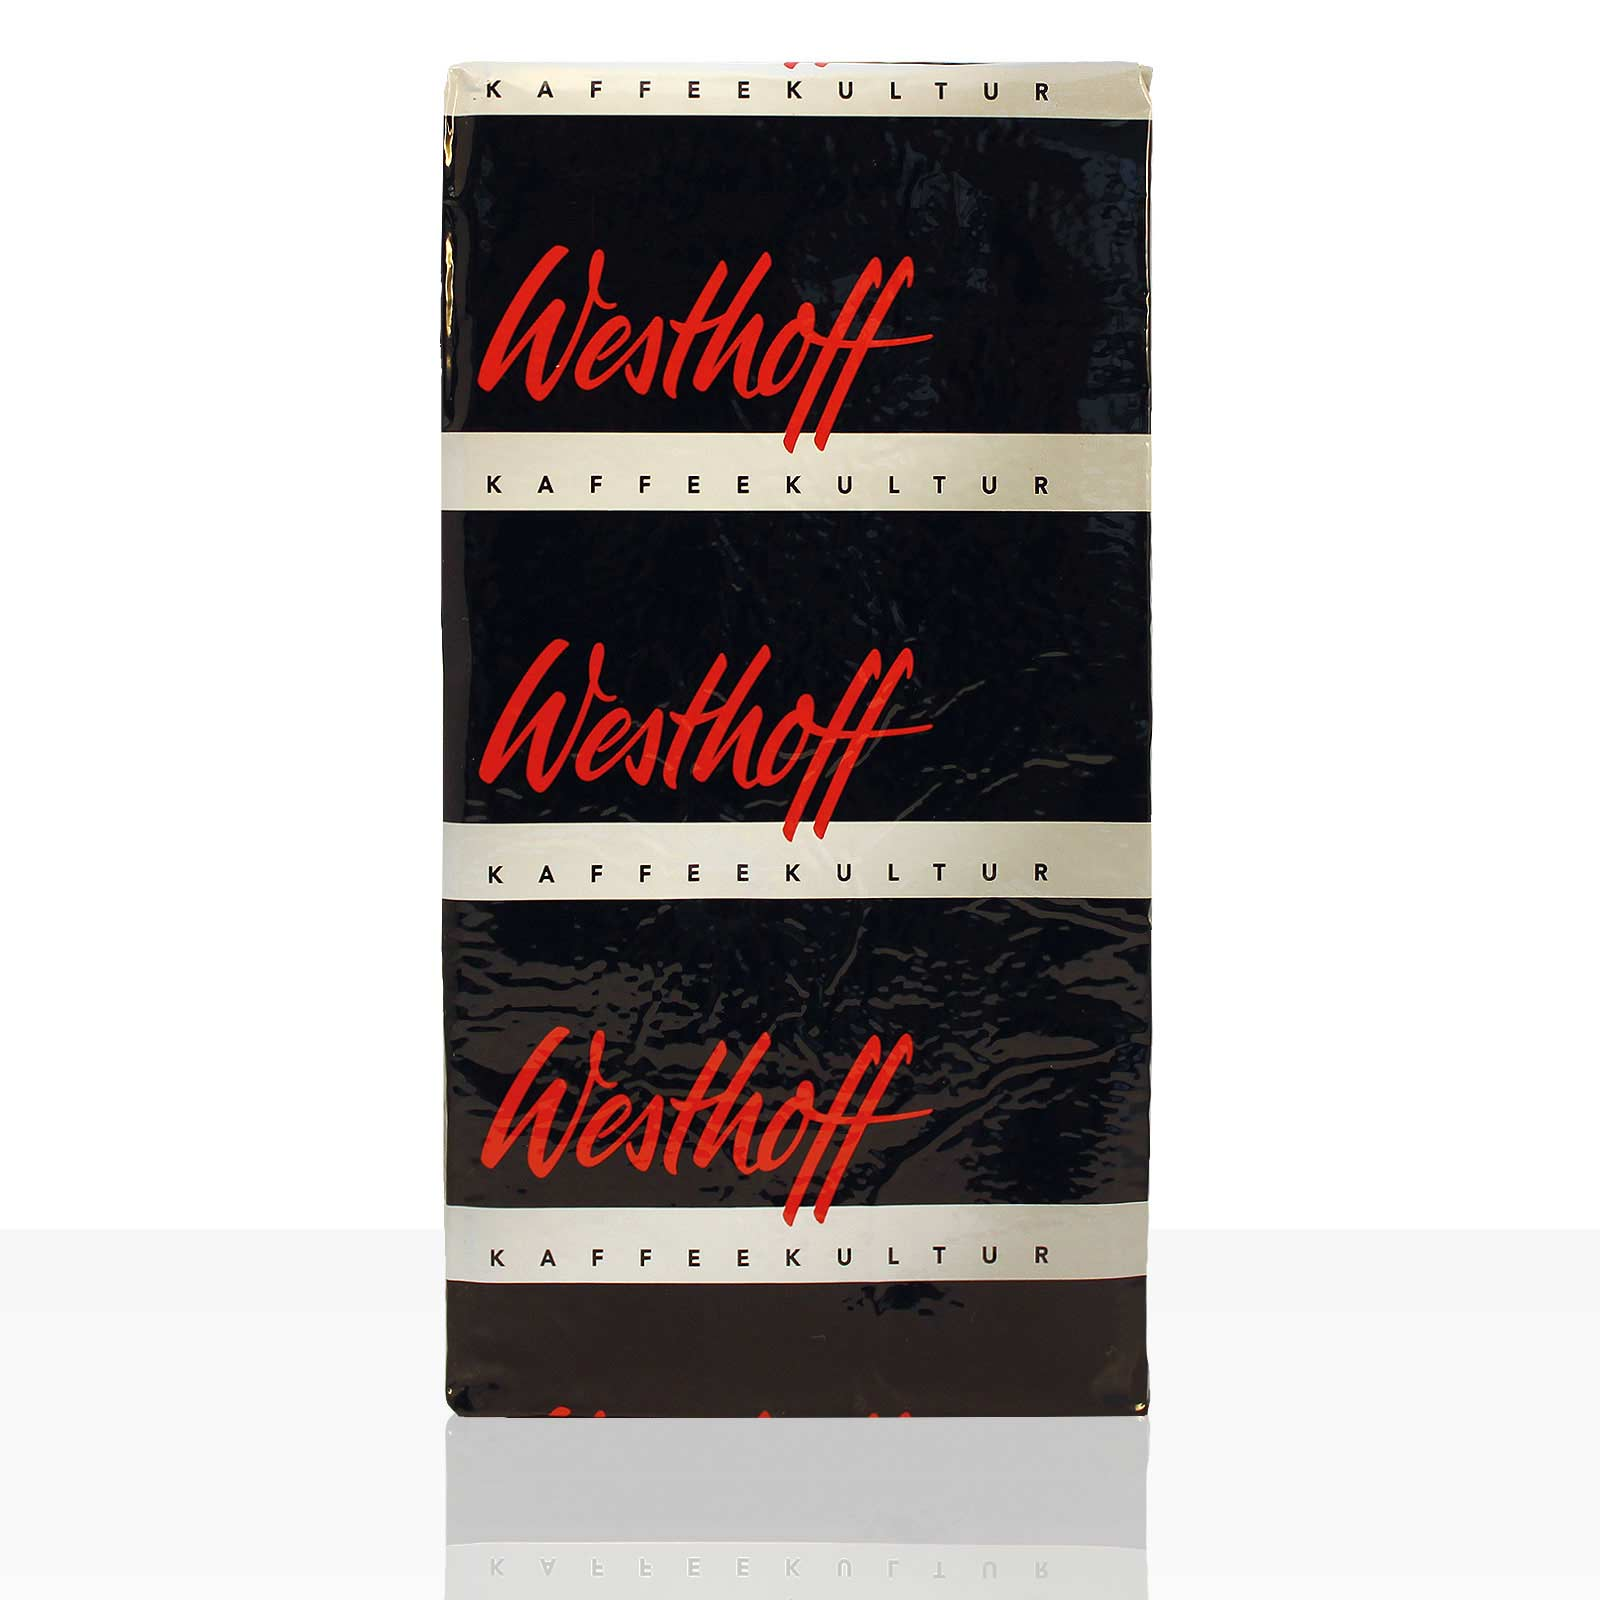 Westhoff Merkur - 12 x 500g Kaffee gemahlen, Filterkaffee